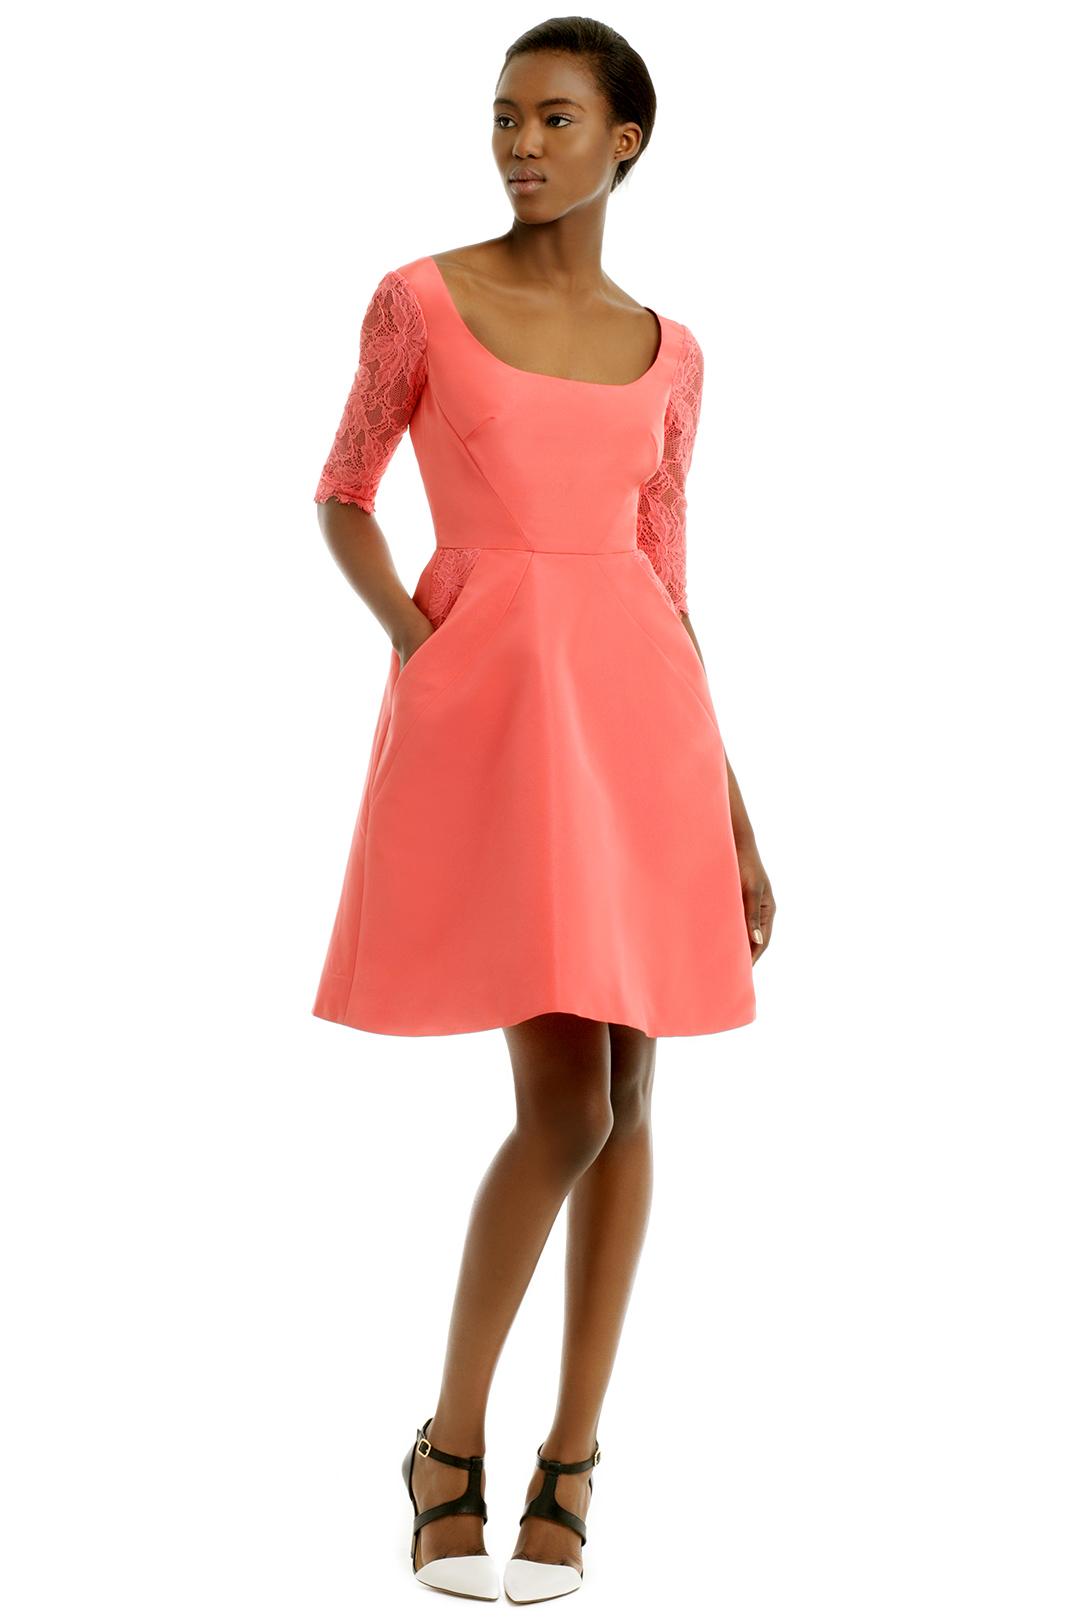 Monique Lhuillier Peach Kiss Dress